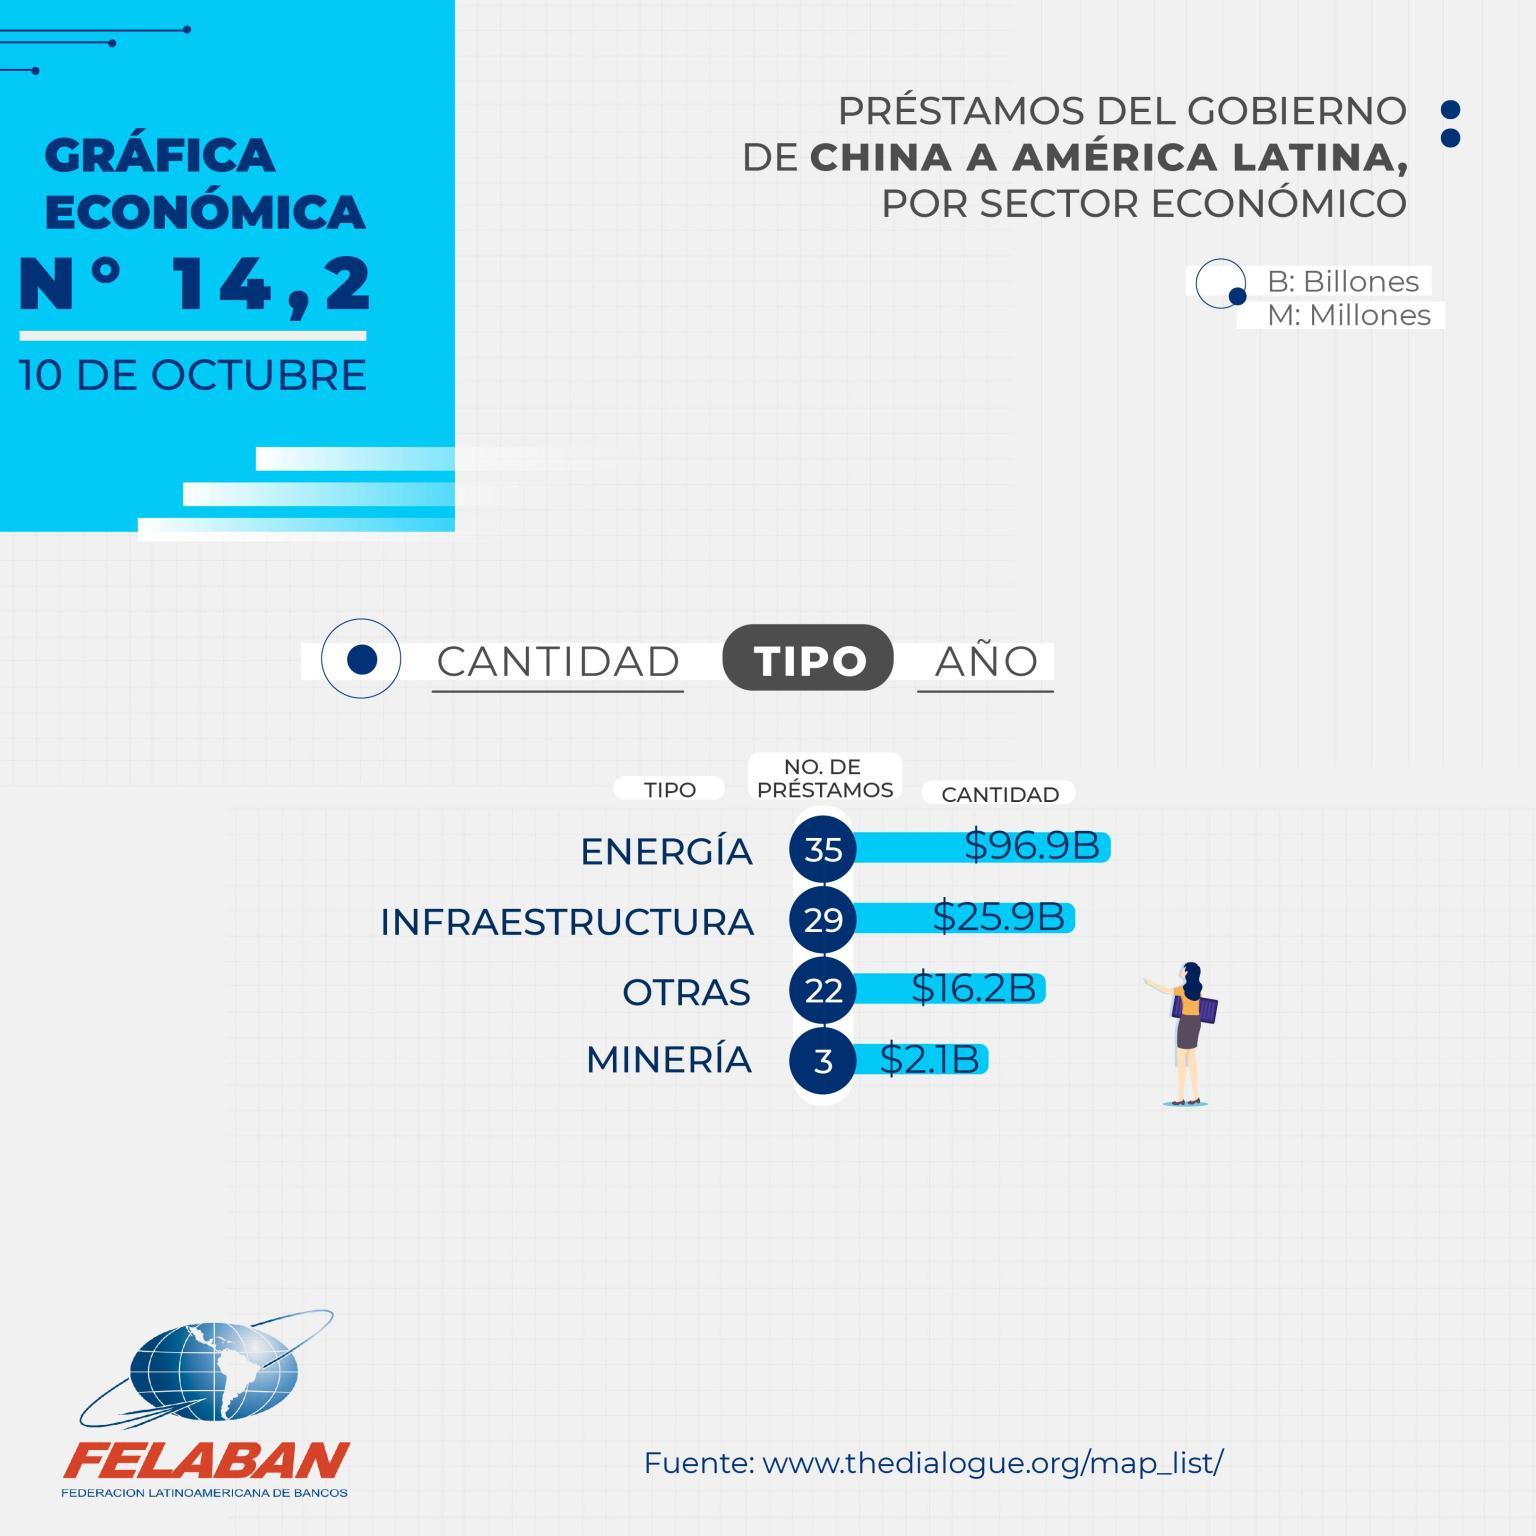 Gráfica Económica Nro 14-2 - Préstamos del Gobierno de China a América Latina, por Sector Económico